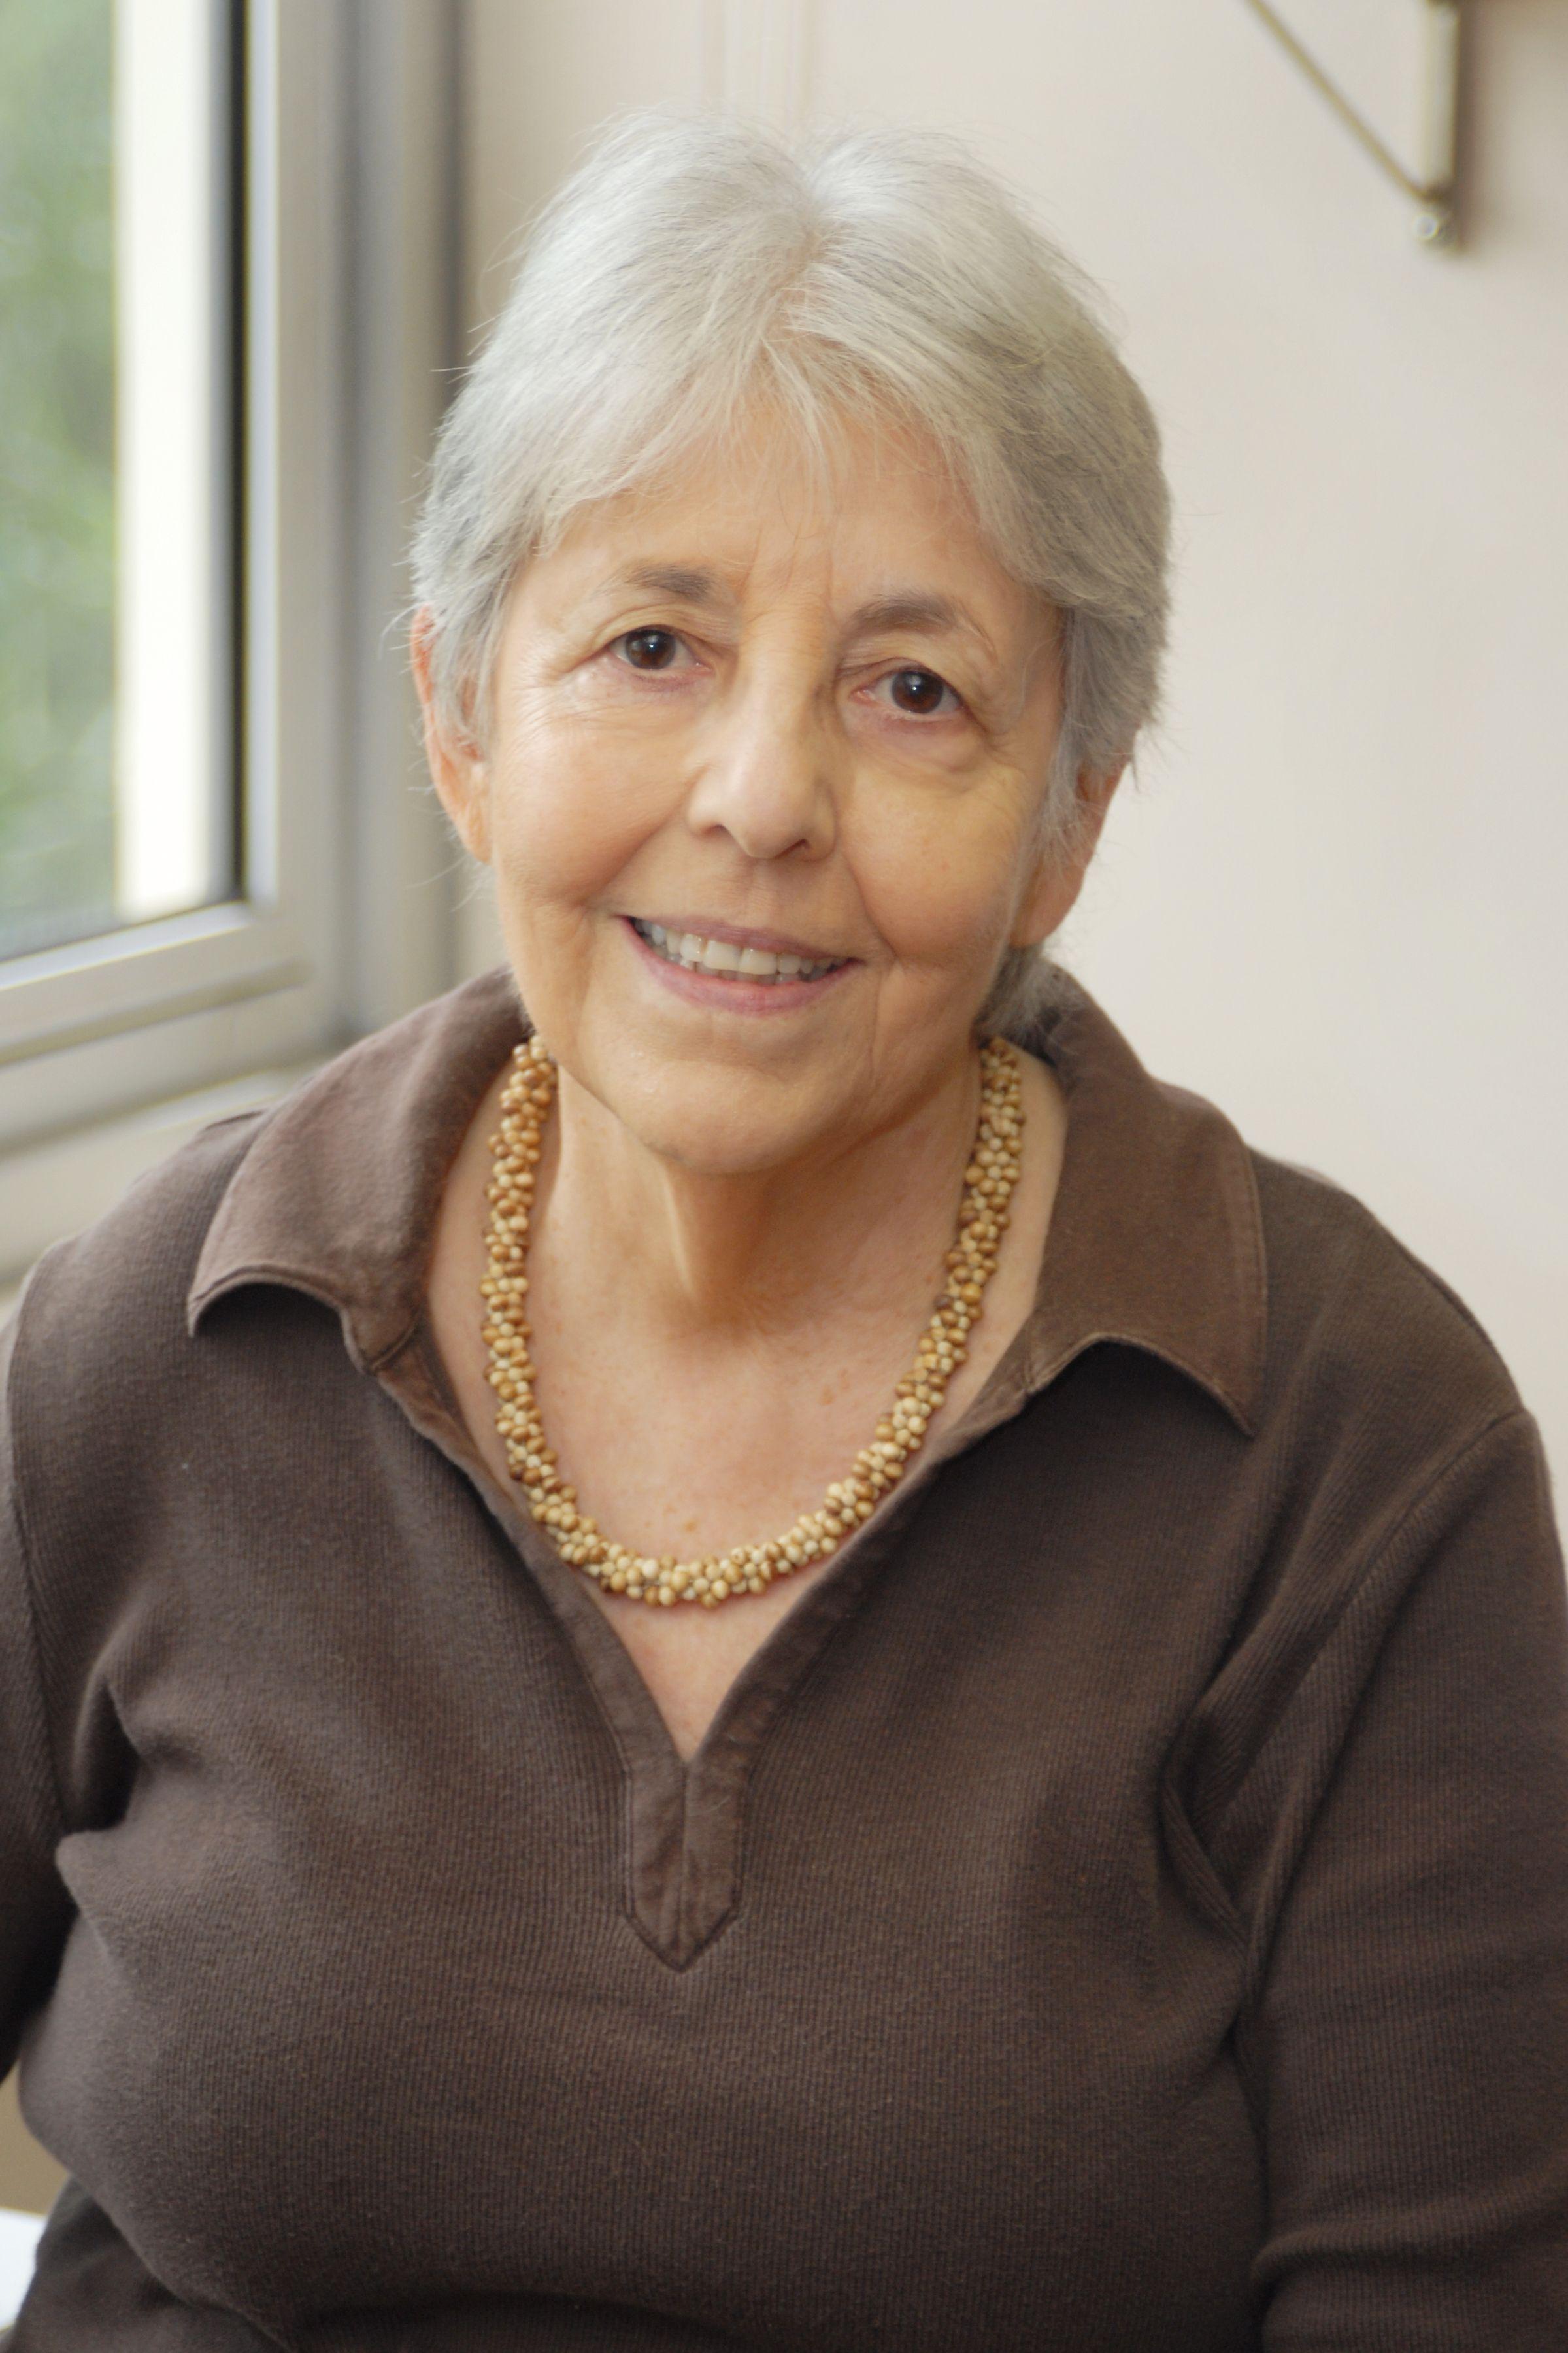 Portrait of Olga Linares in her office.